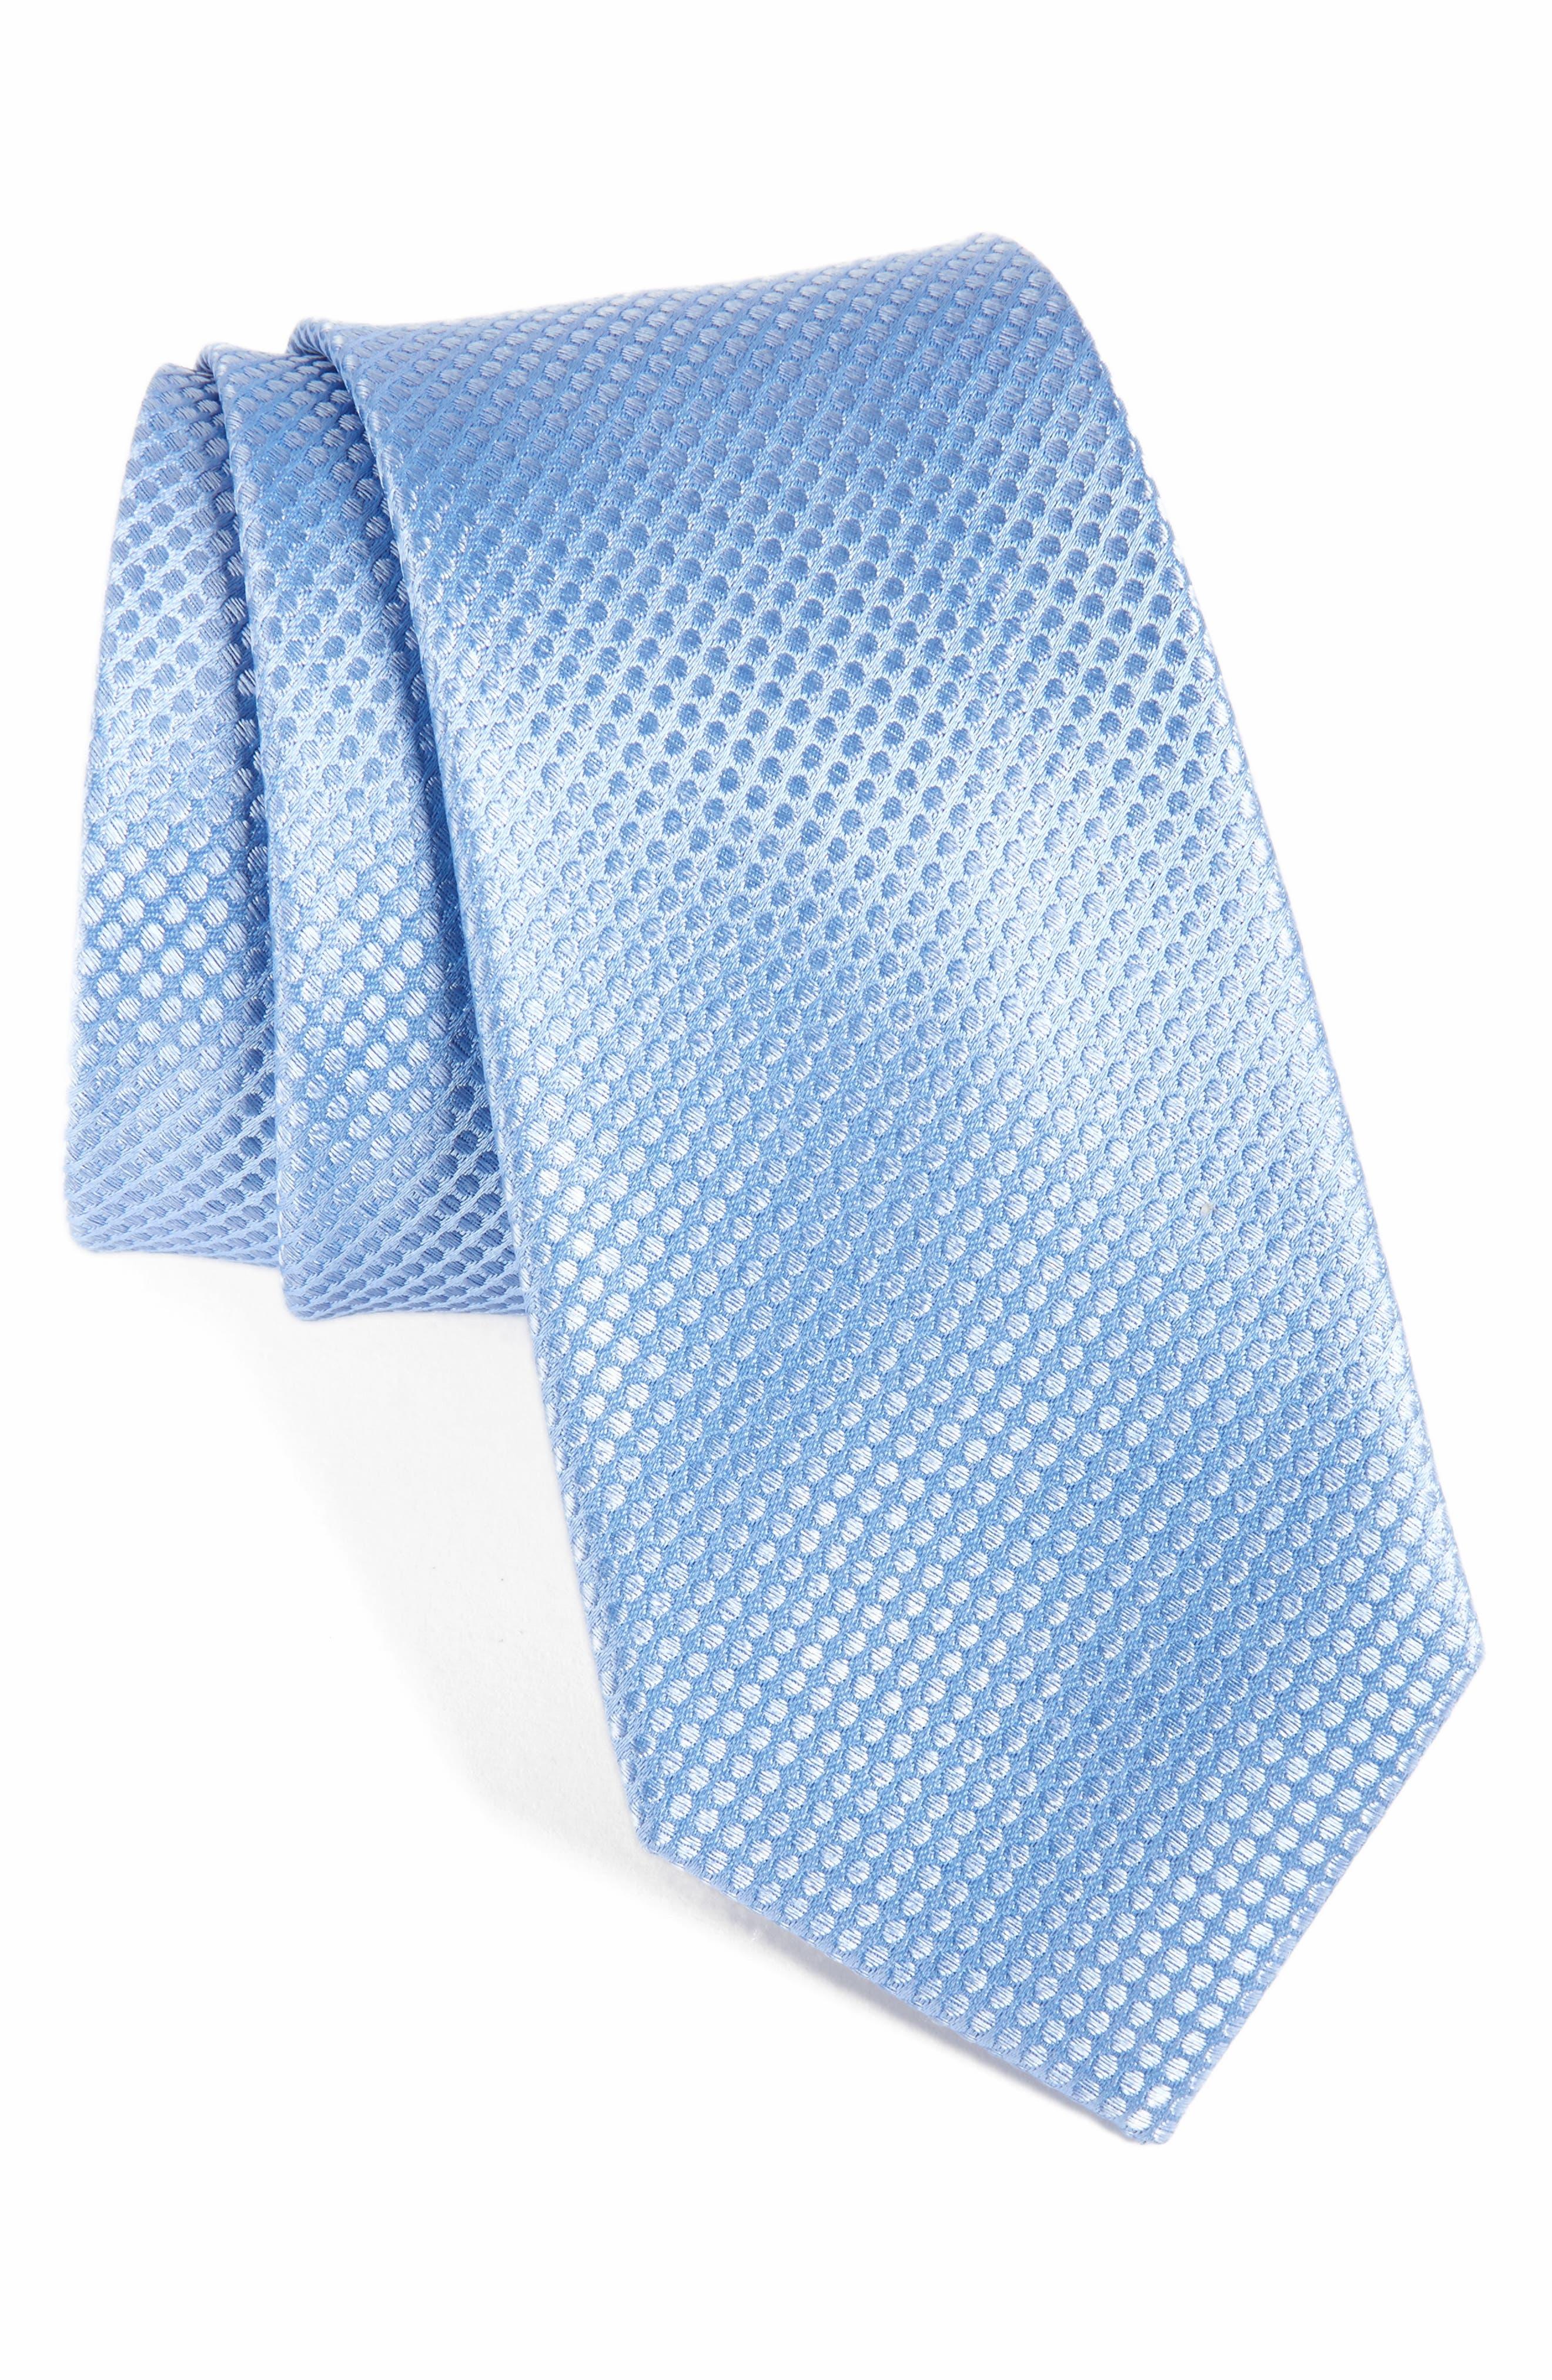 Calibrate Saturated Dot Silk Tie